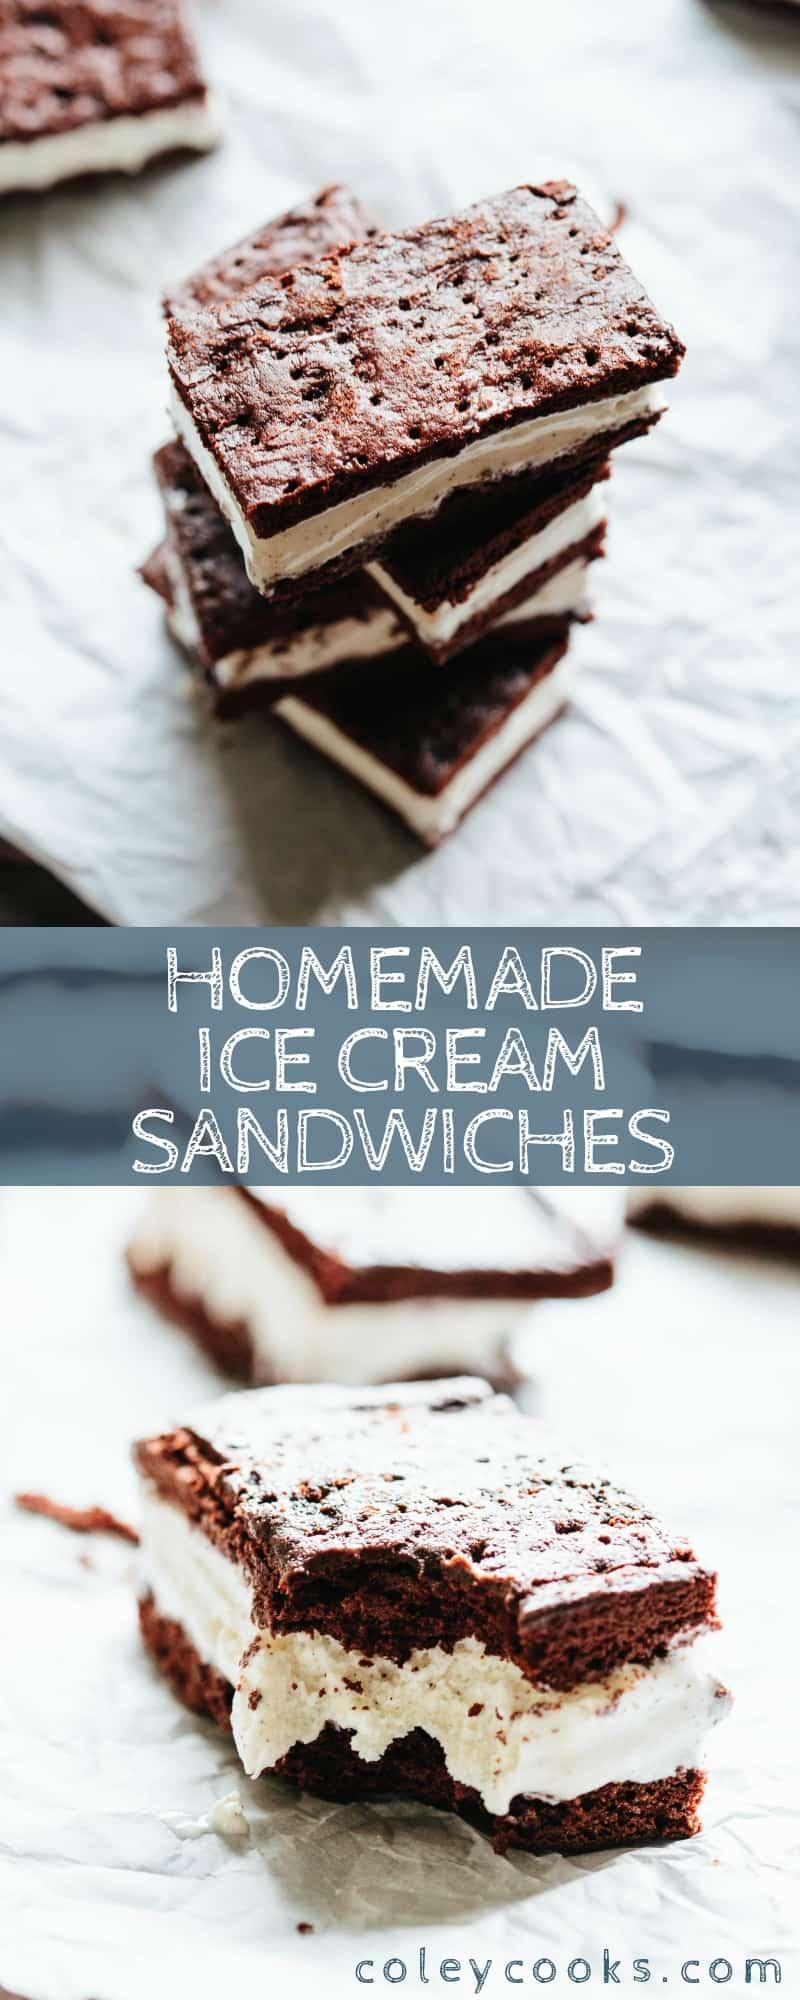 Pinterest collage of homemade ice cream sandwich recipe.